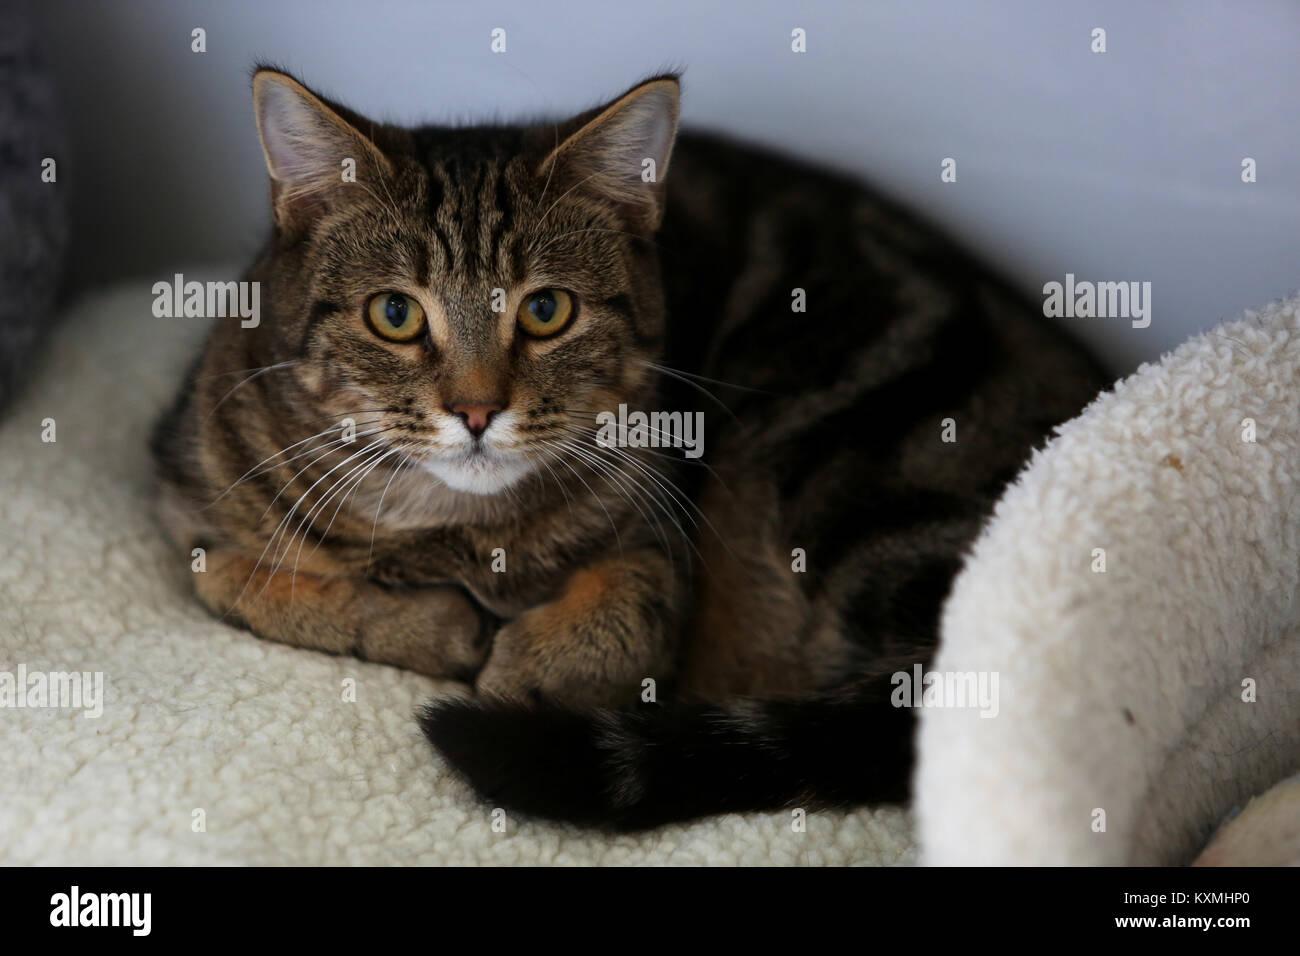 Cat And Rabbit Rescue Sidlesham